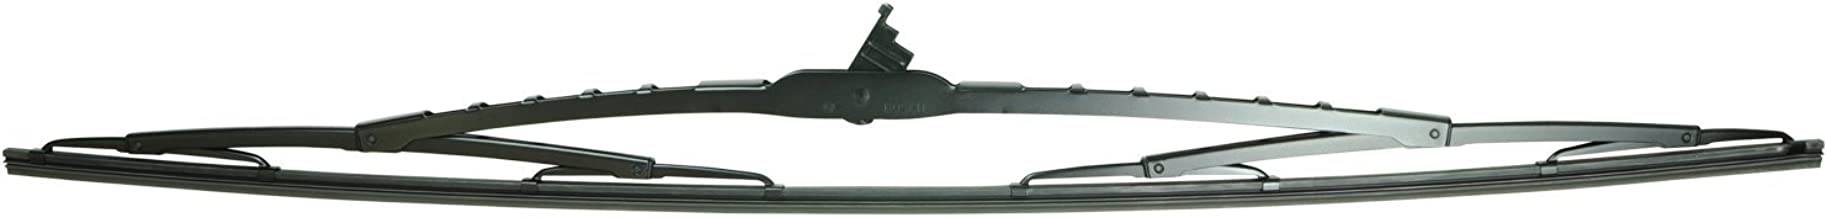 Bosch Automotive 40526 Wiper Blade, 26 Inches